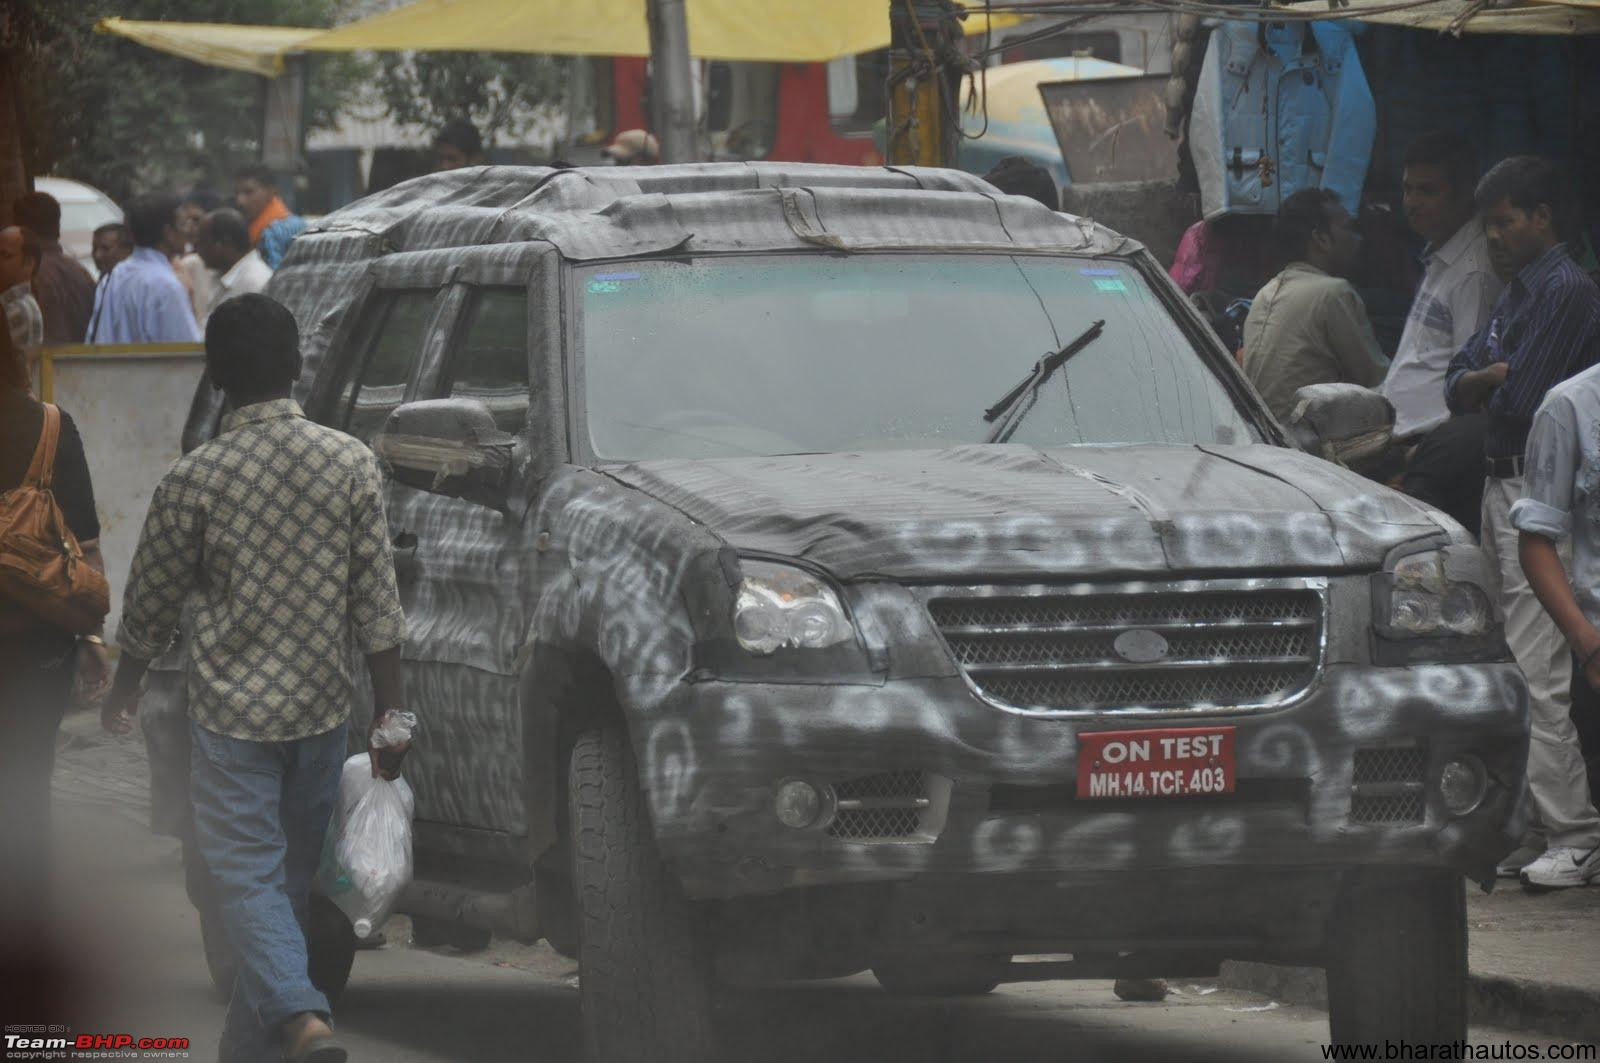 team bhp archives - bharathautos - automobile news updates